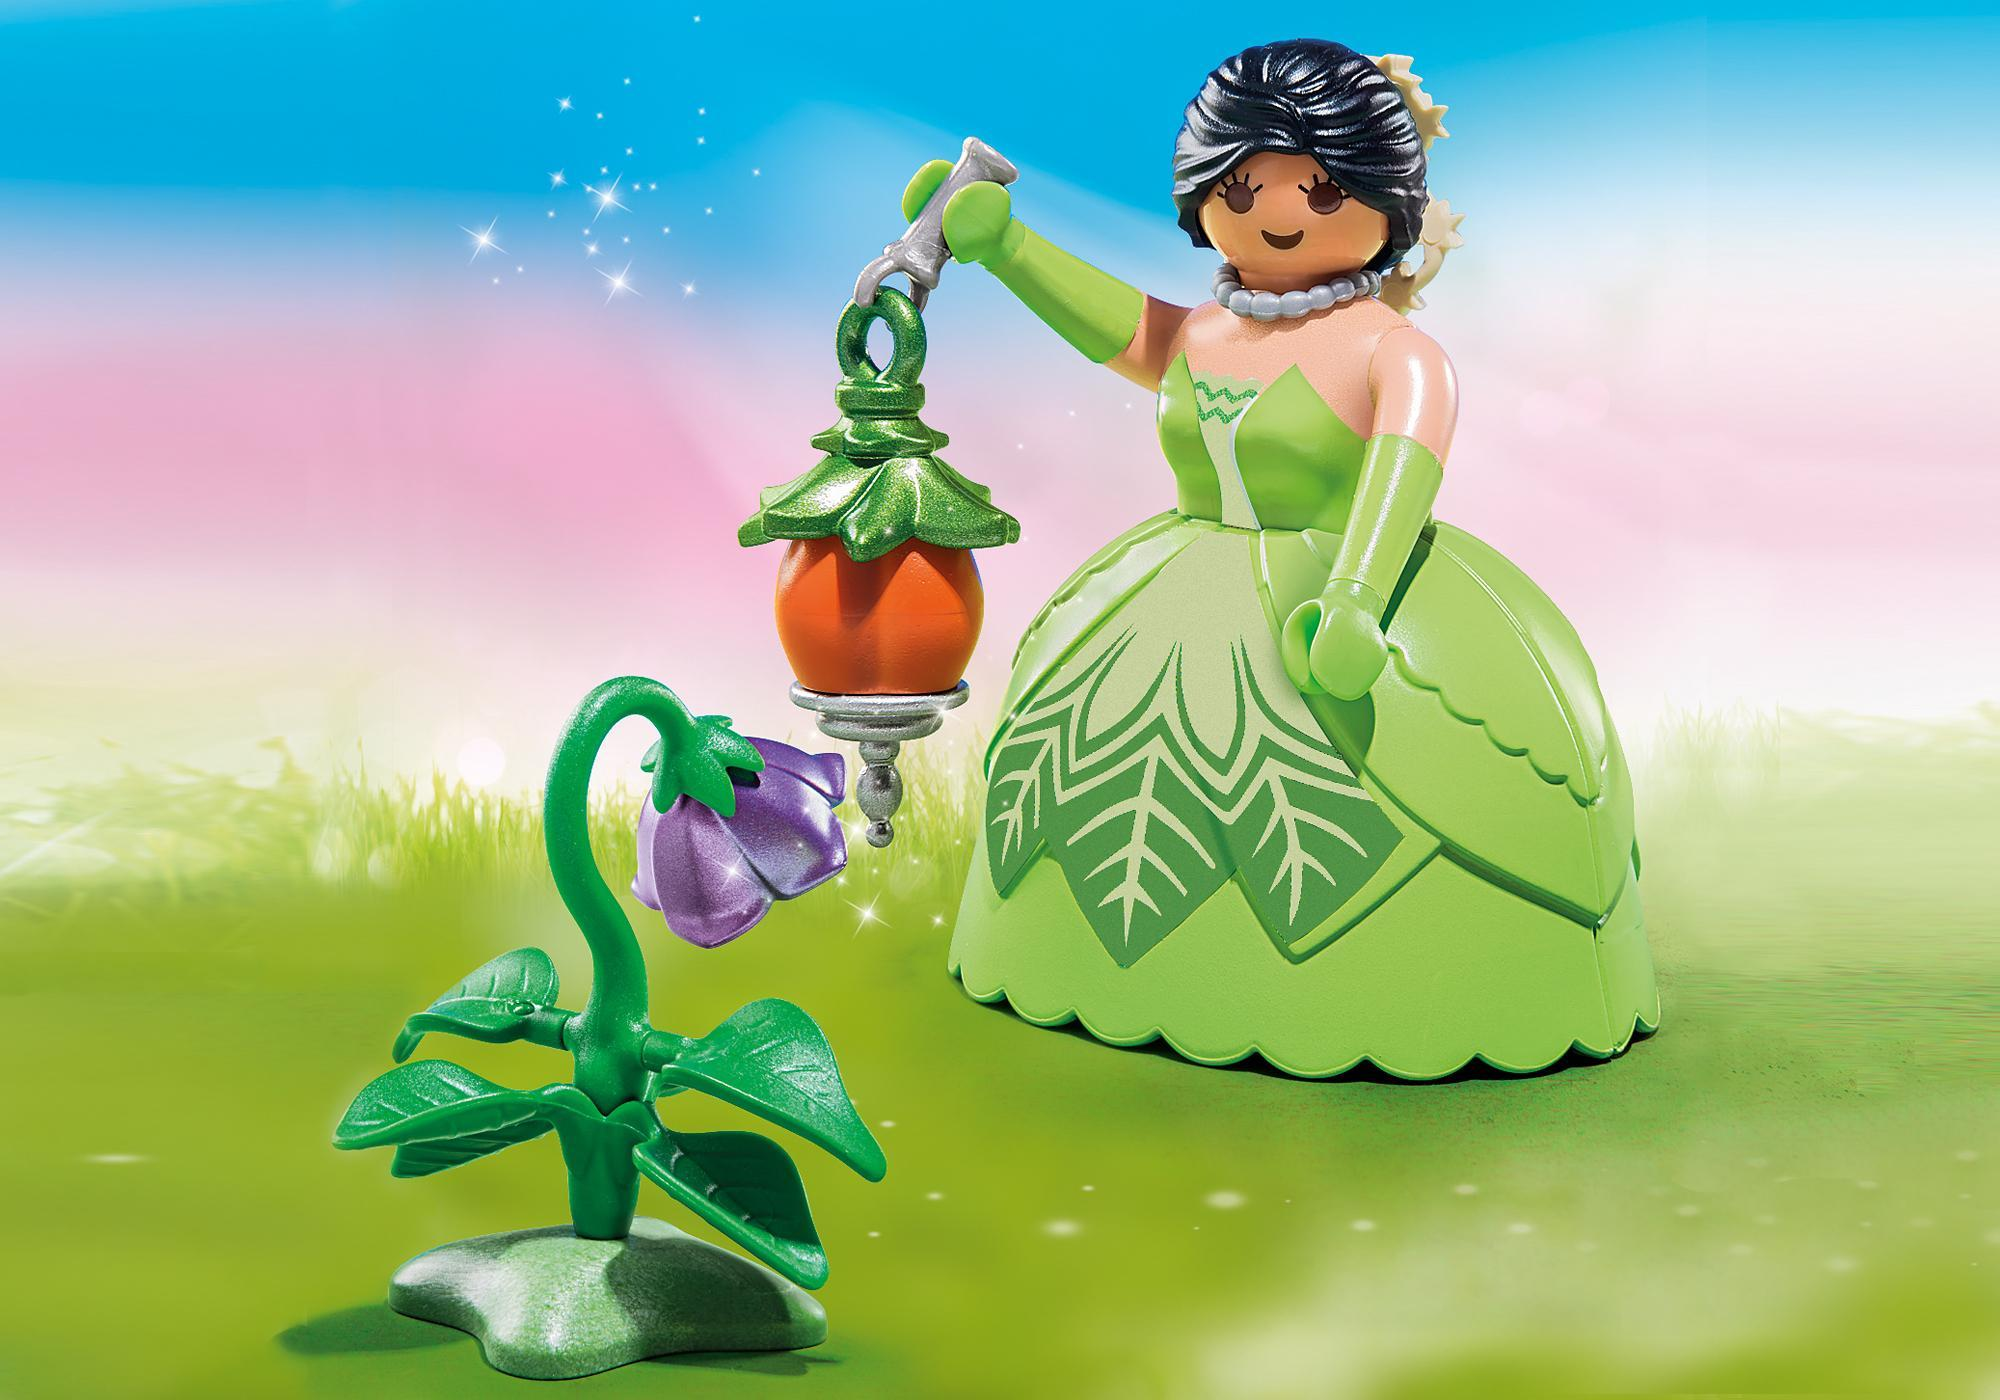 5375_product_detail/Princesa del Bosque